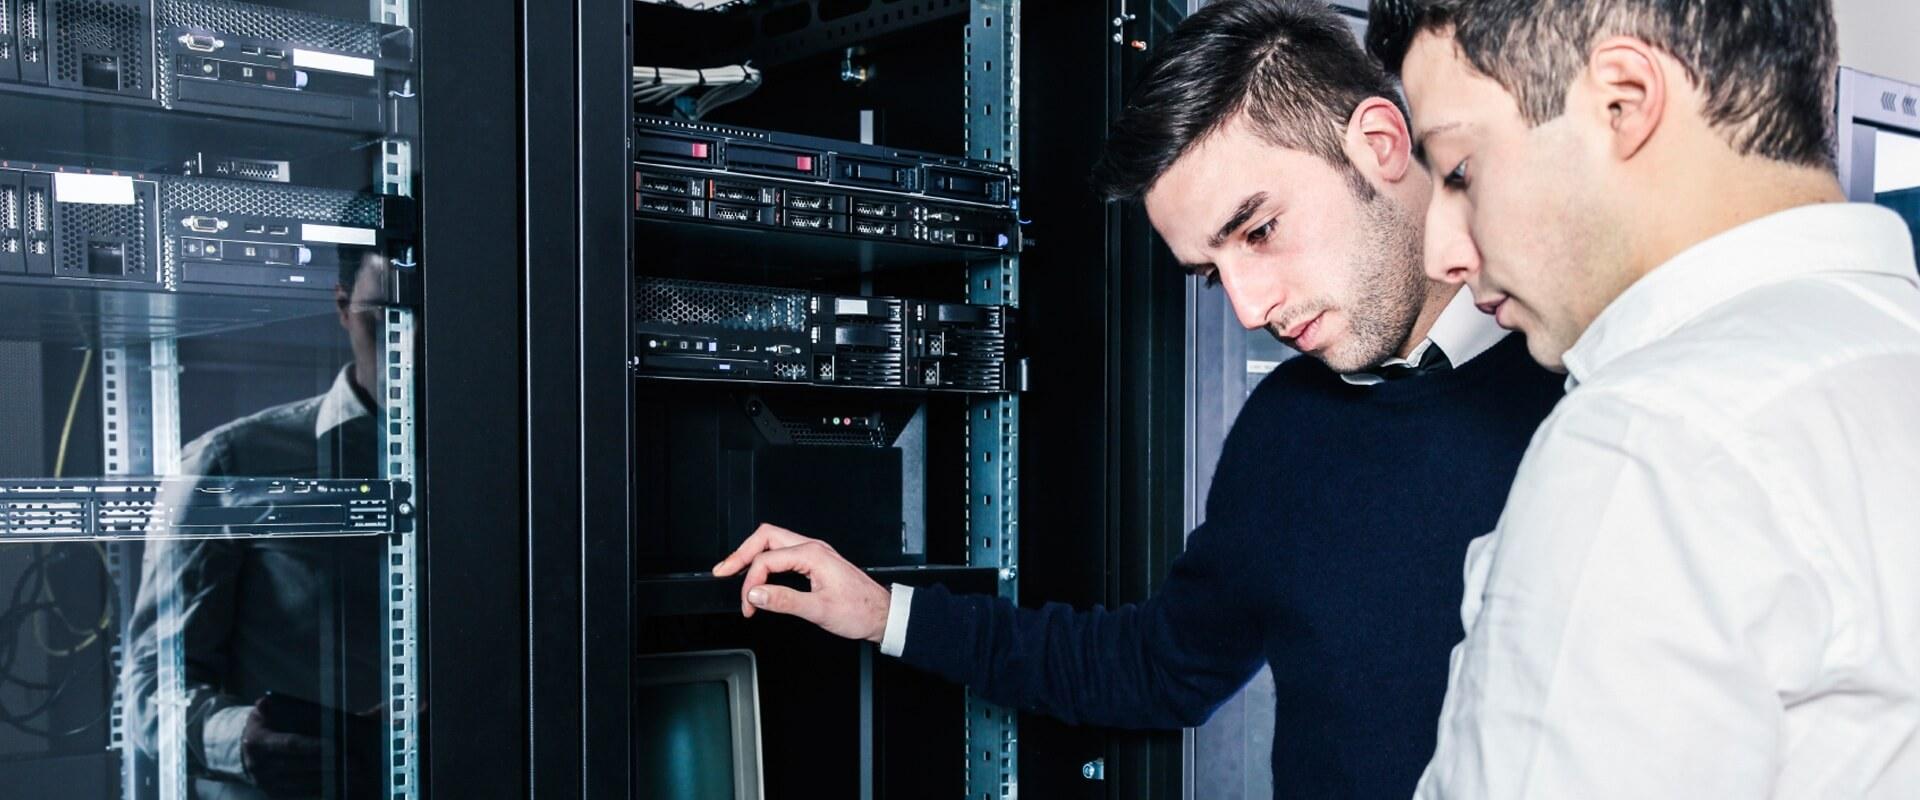 IT-Securitiy_Server_1920-x-800-px--Hero-Banner.jpg